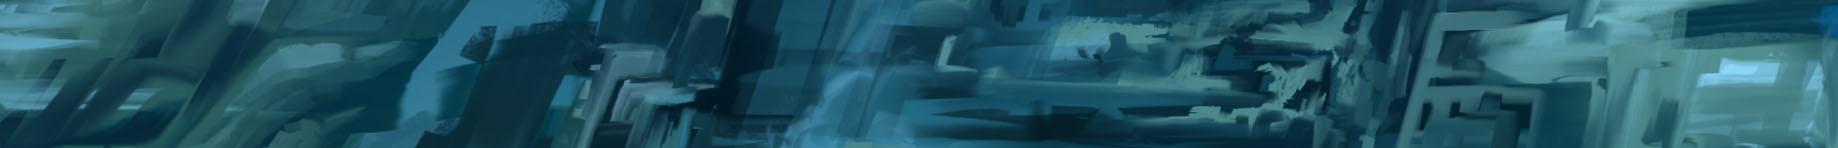 <div class='title'>           billboardoptionsMoreArt-0067-Layer-33-qeldcz         </div>